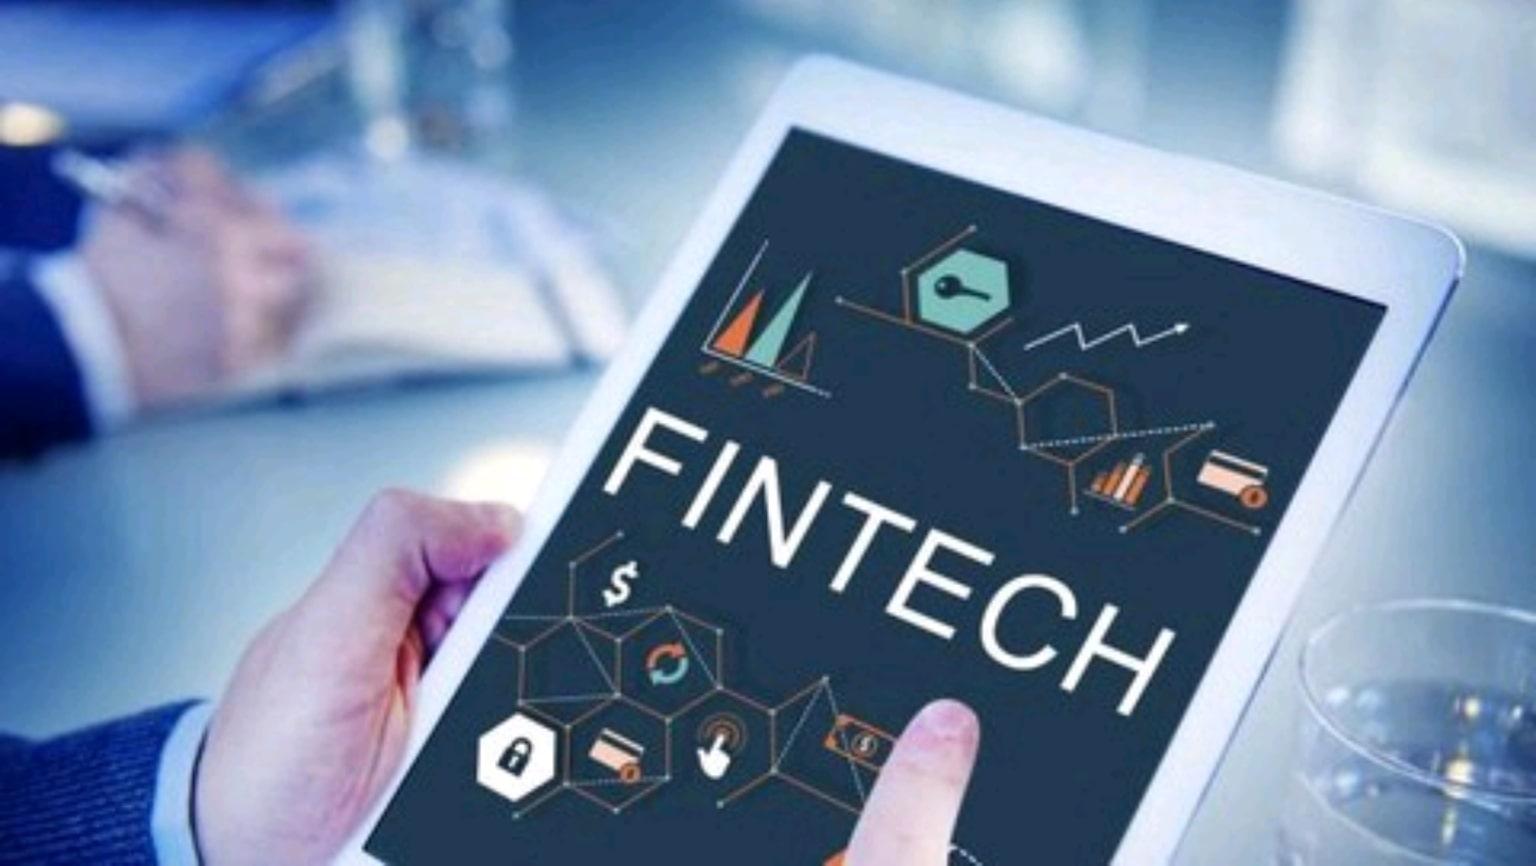 fintech companies in Nigeria